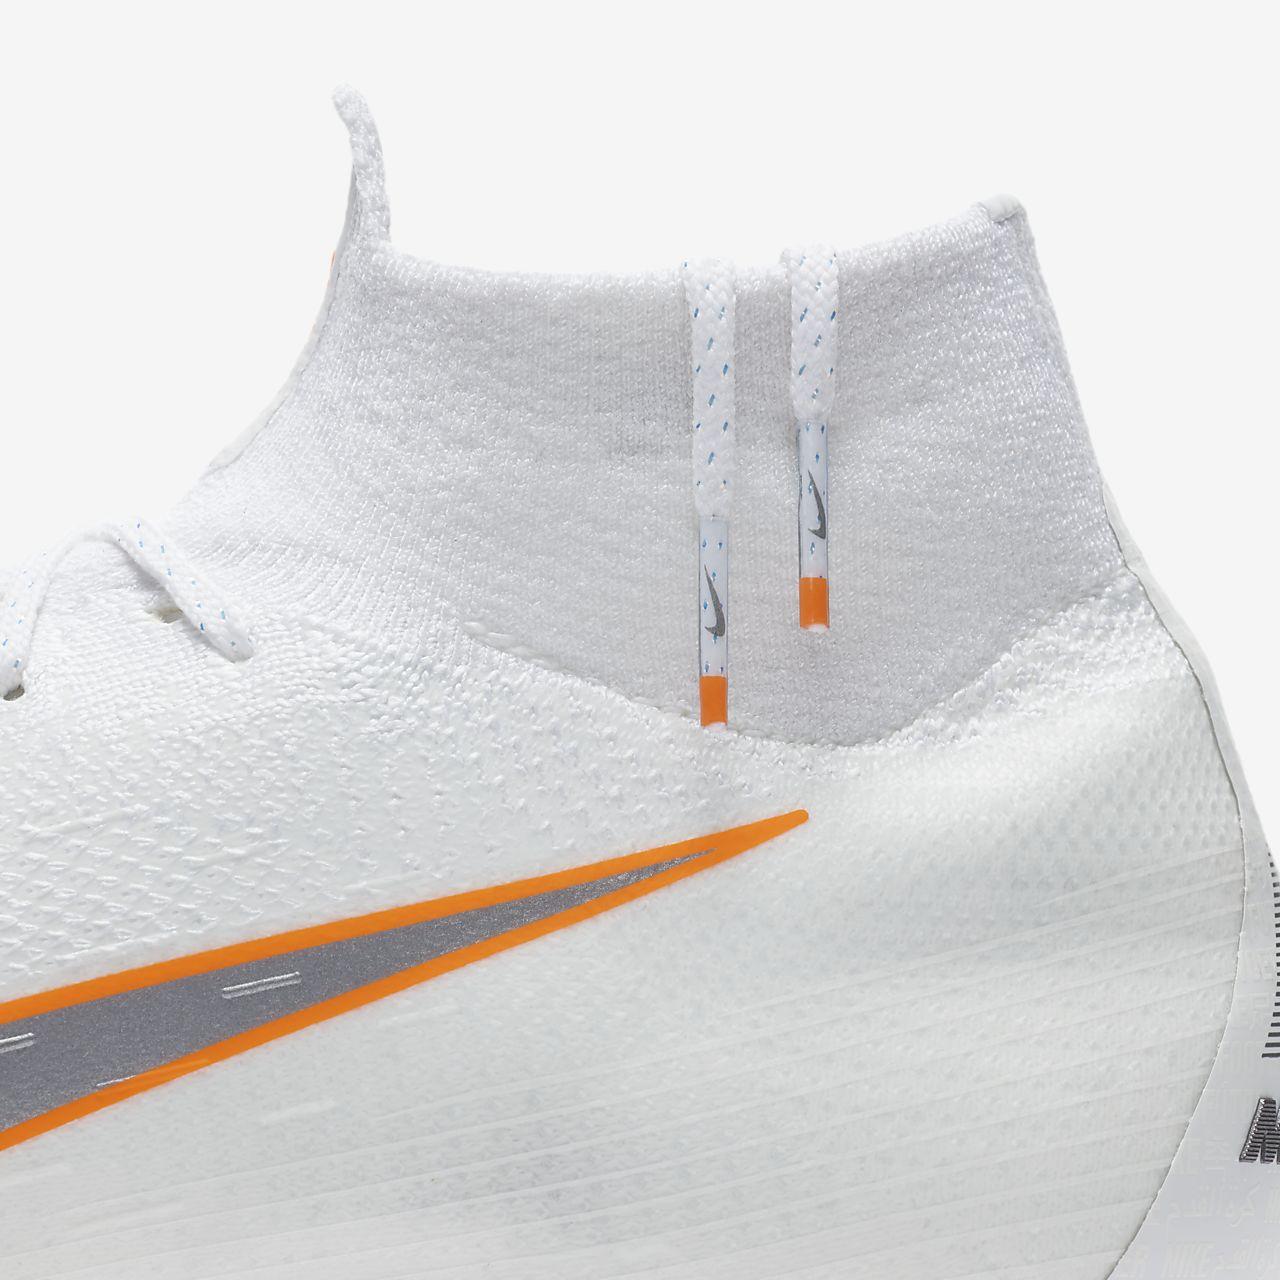 Calzado de fútbol para césped artificial Nike Mercurial Superfly 360 ...